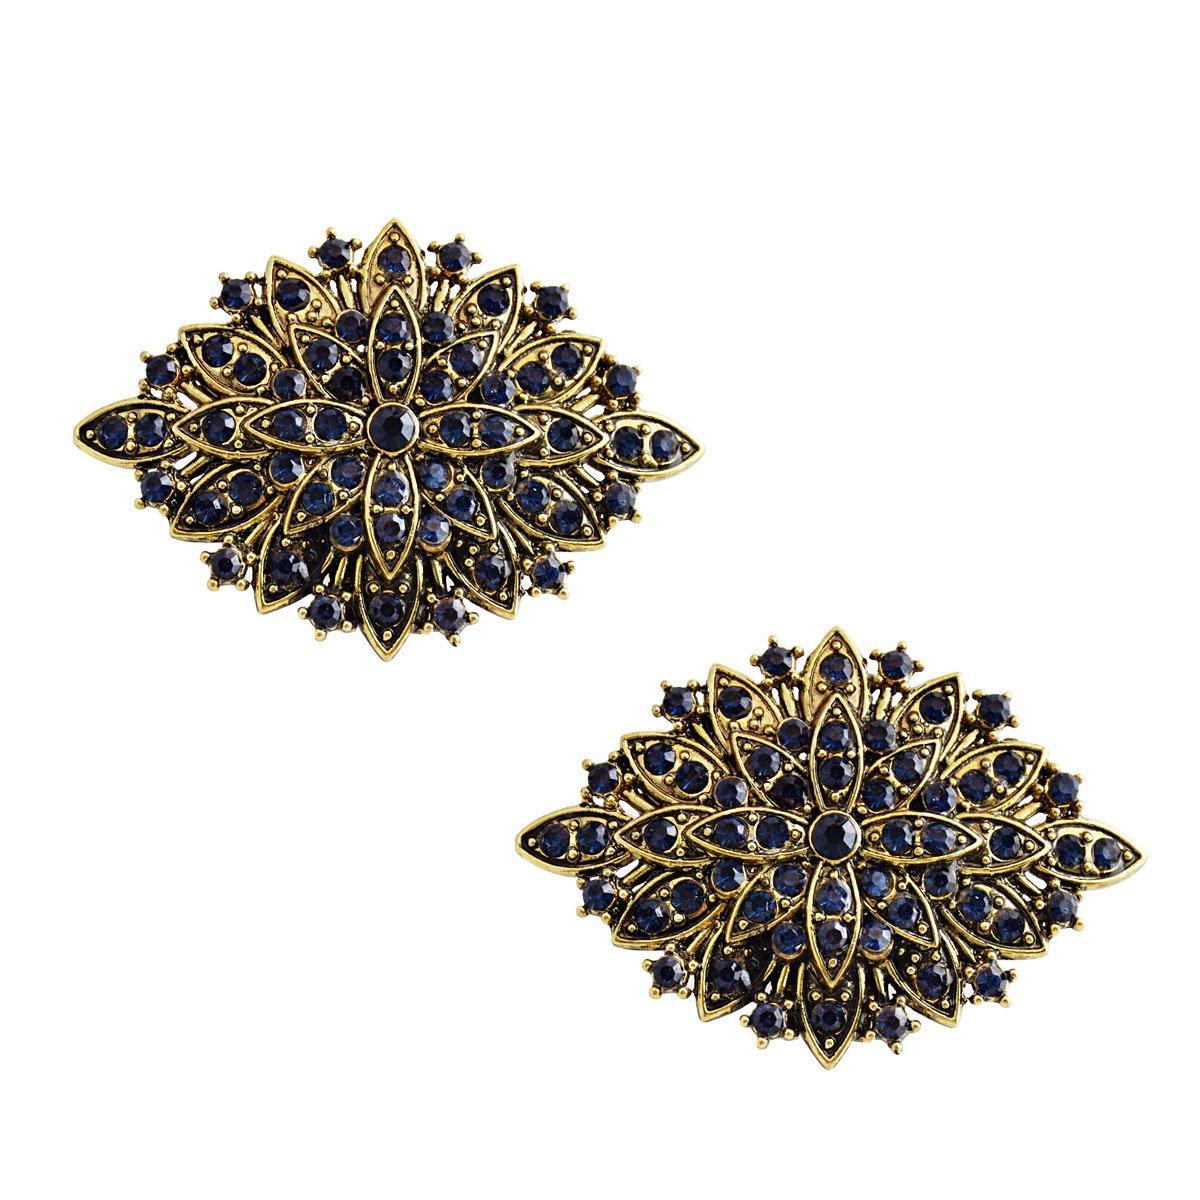 ElegantPark CG Antique Gold Leaf Design Rhinestones Wedding Party Decoration Shoe Clips Navy Blue 2 Pcs